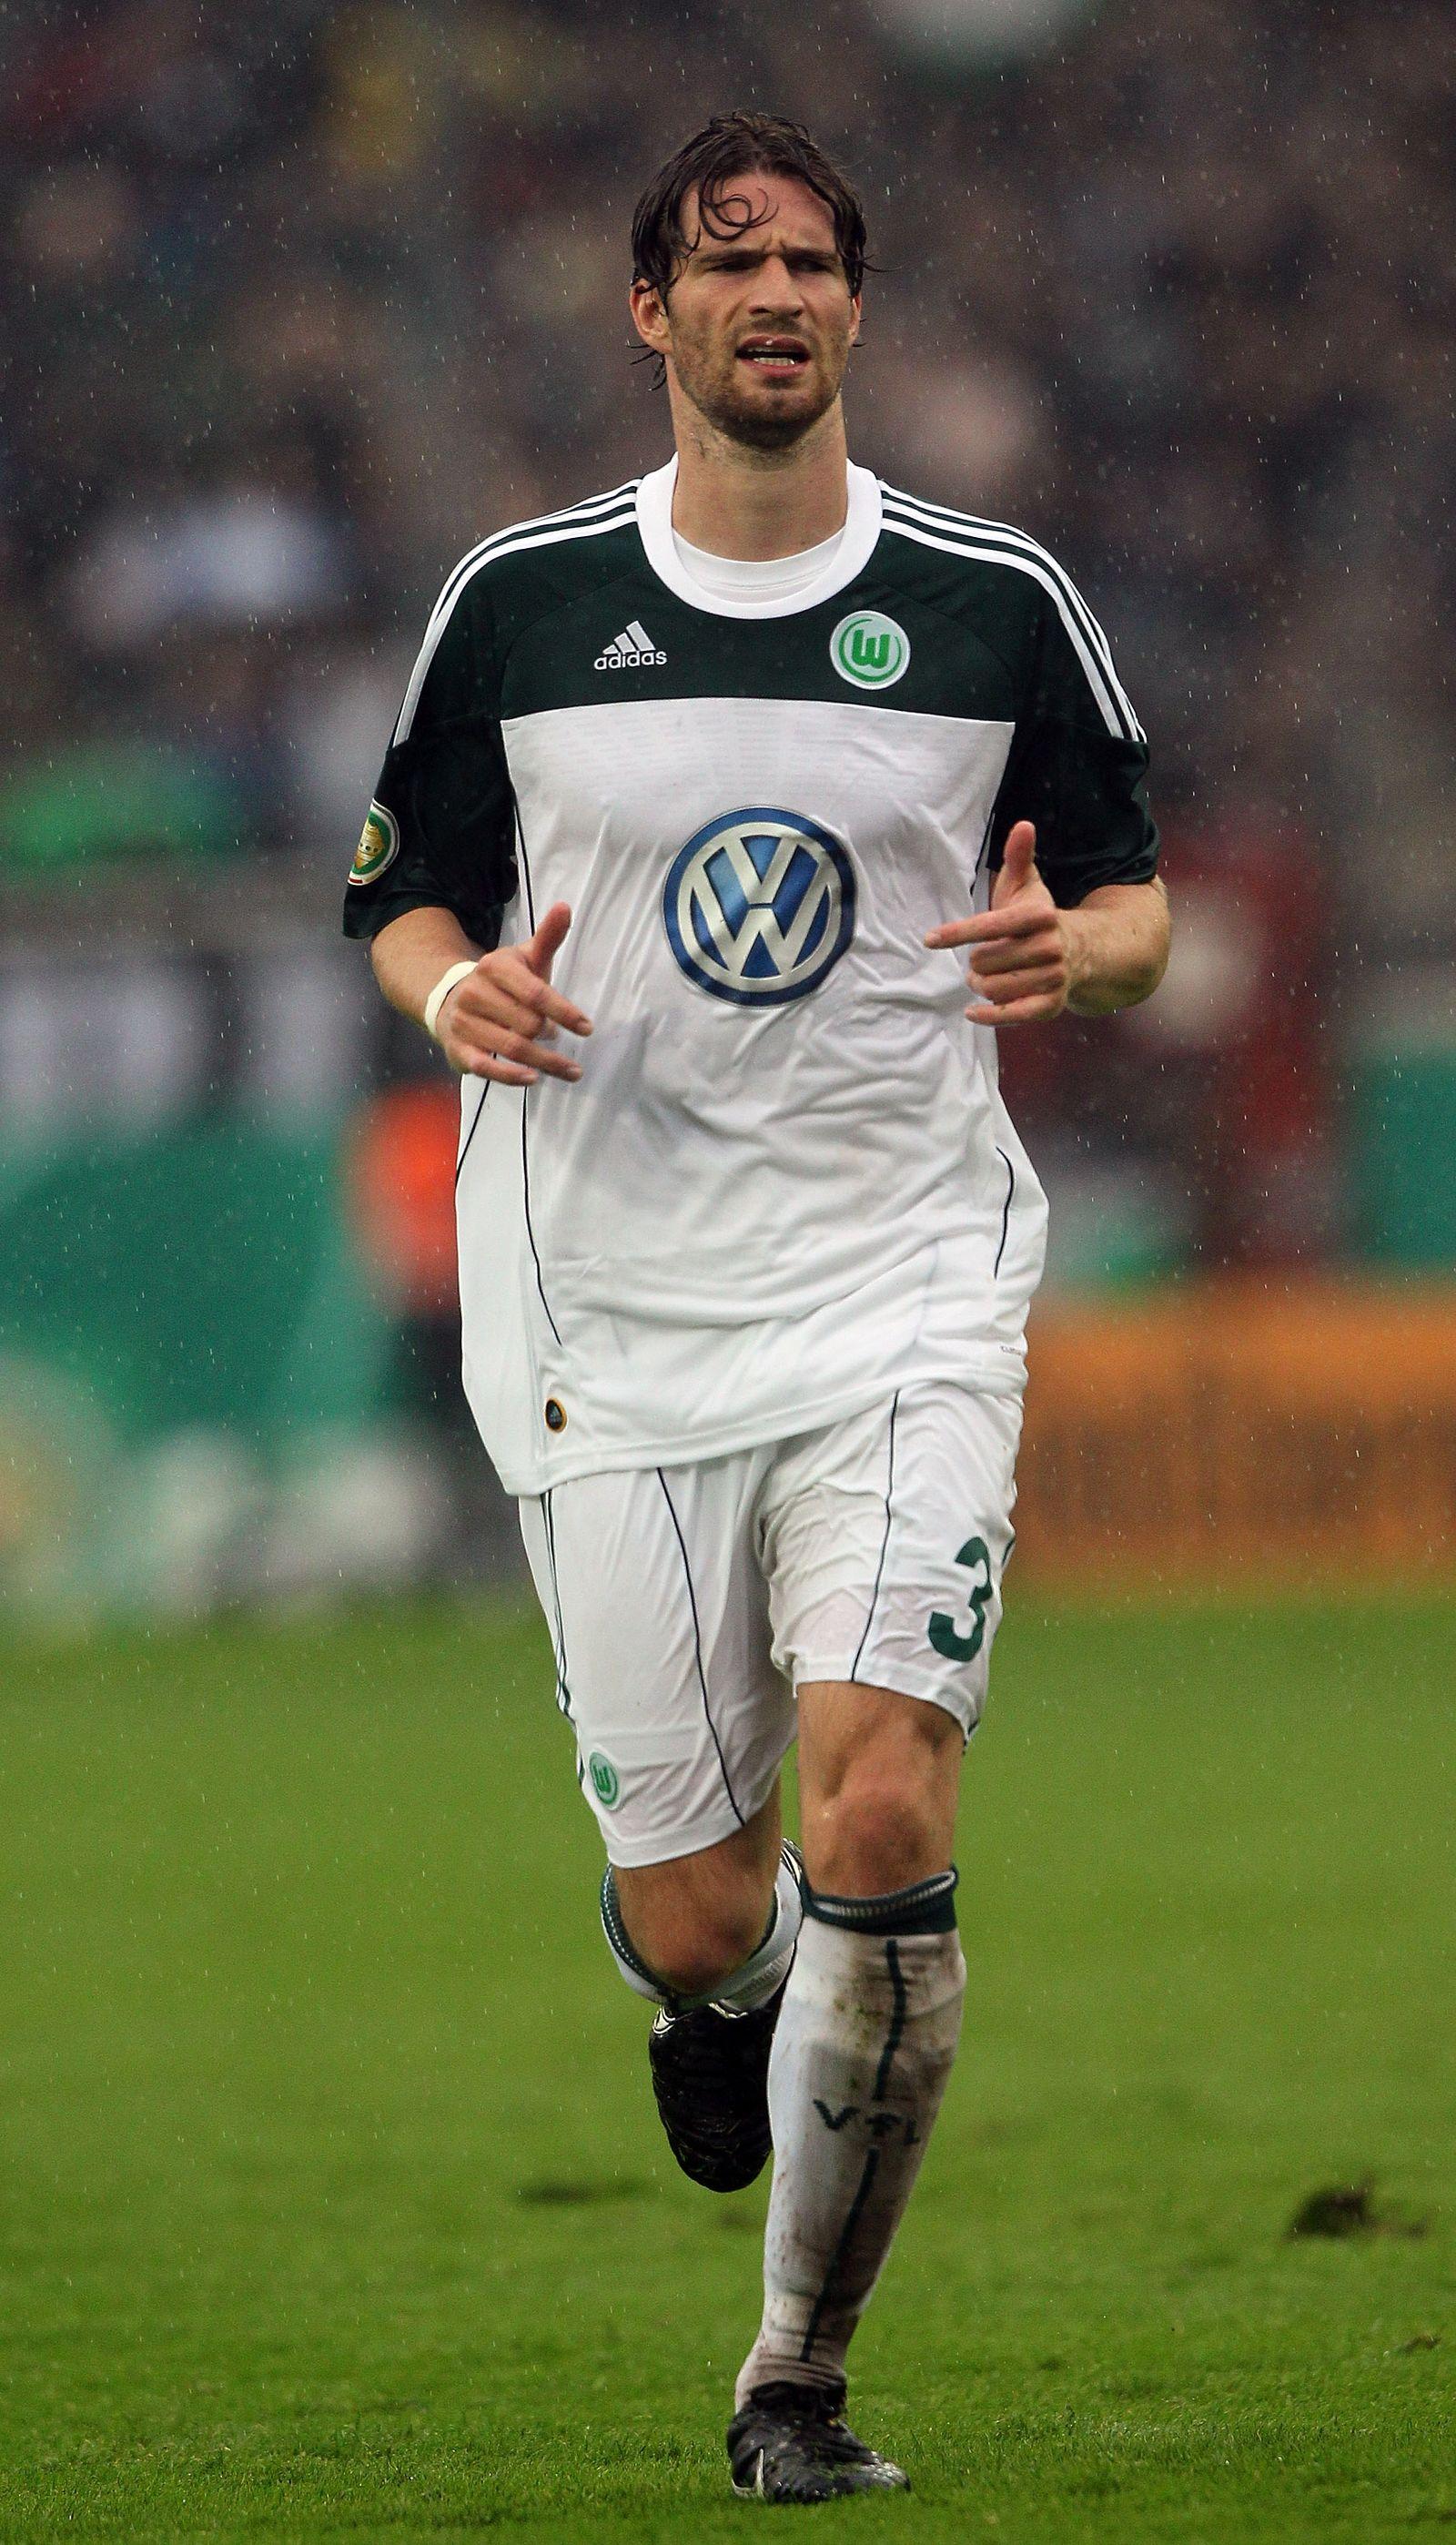 Friedrich joggt